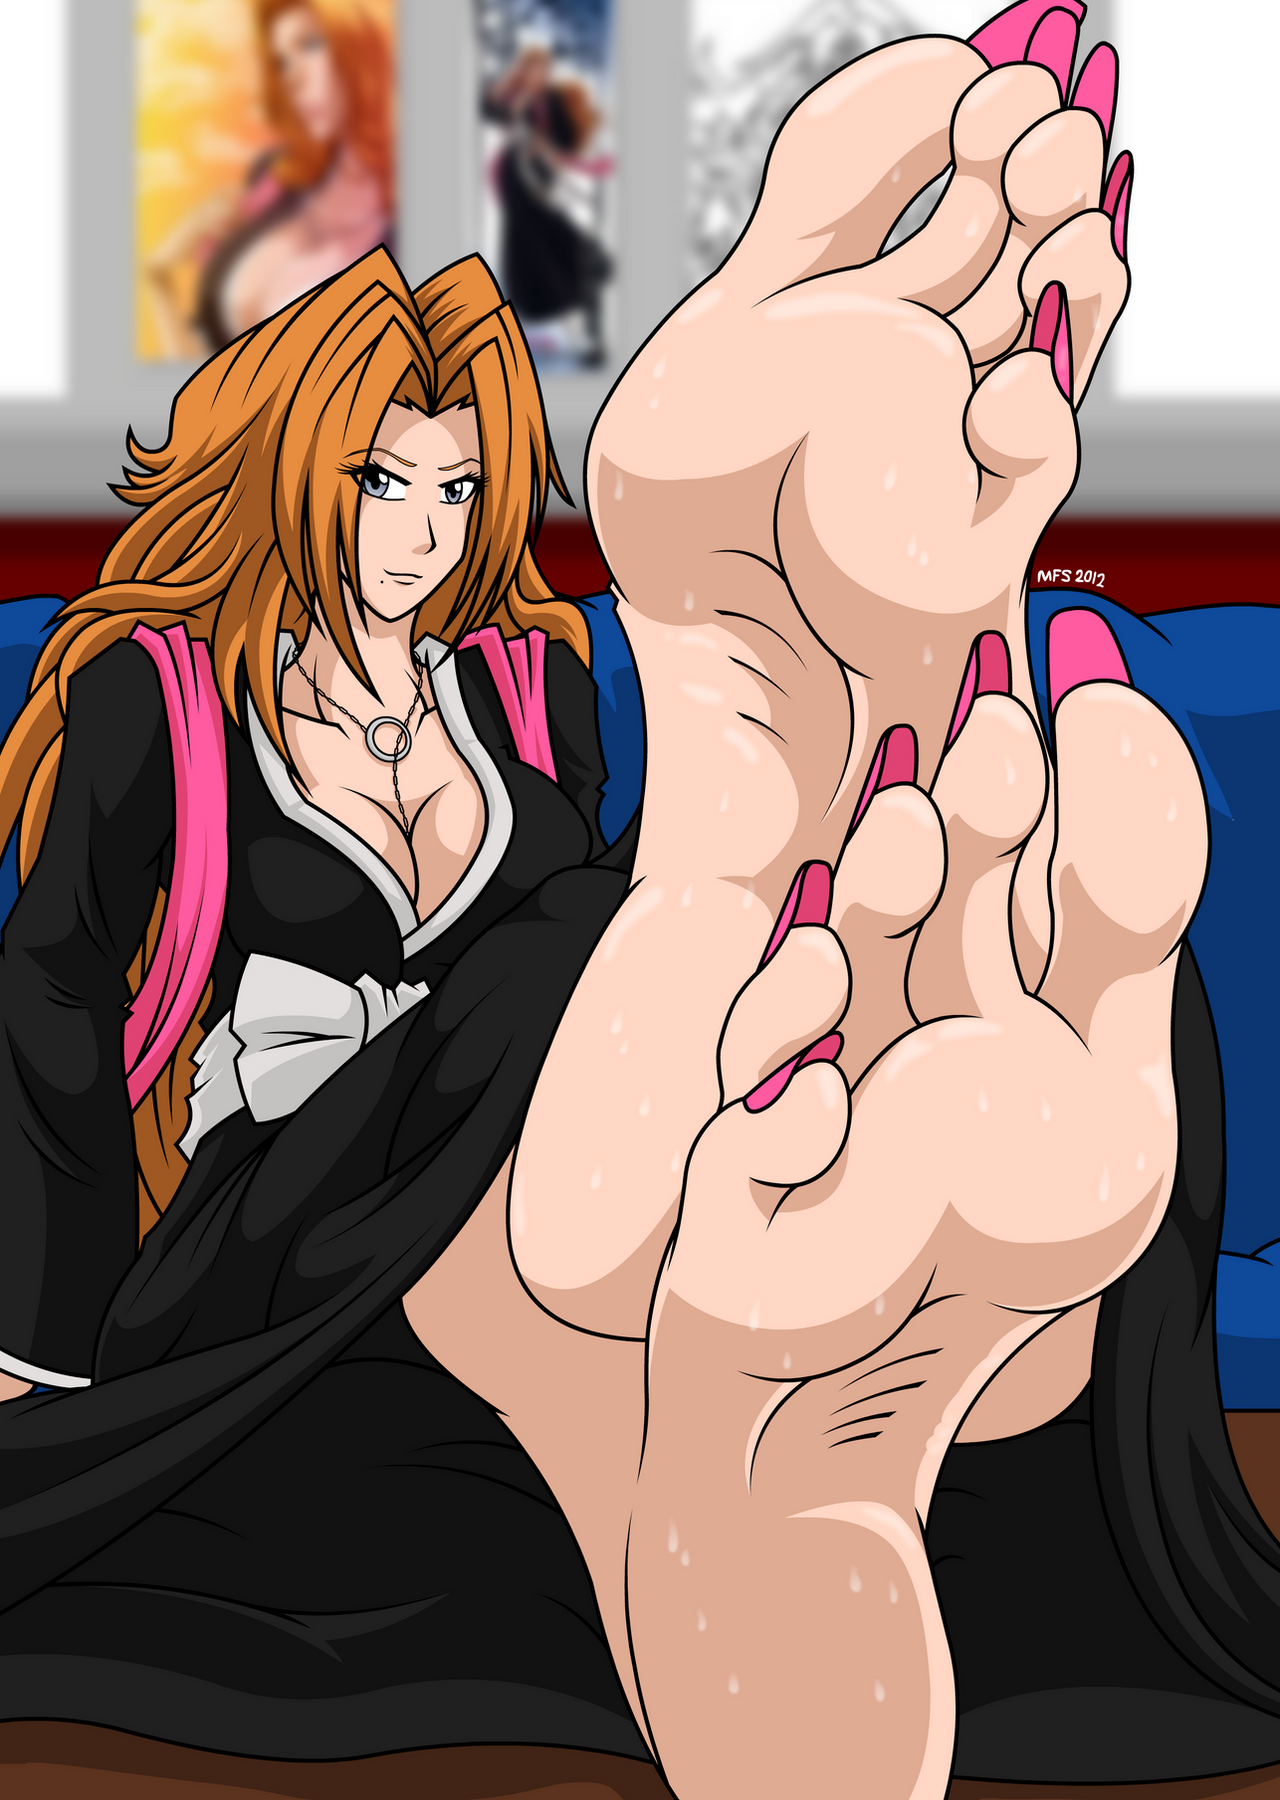 Bleach hentai feet assfucking